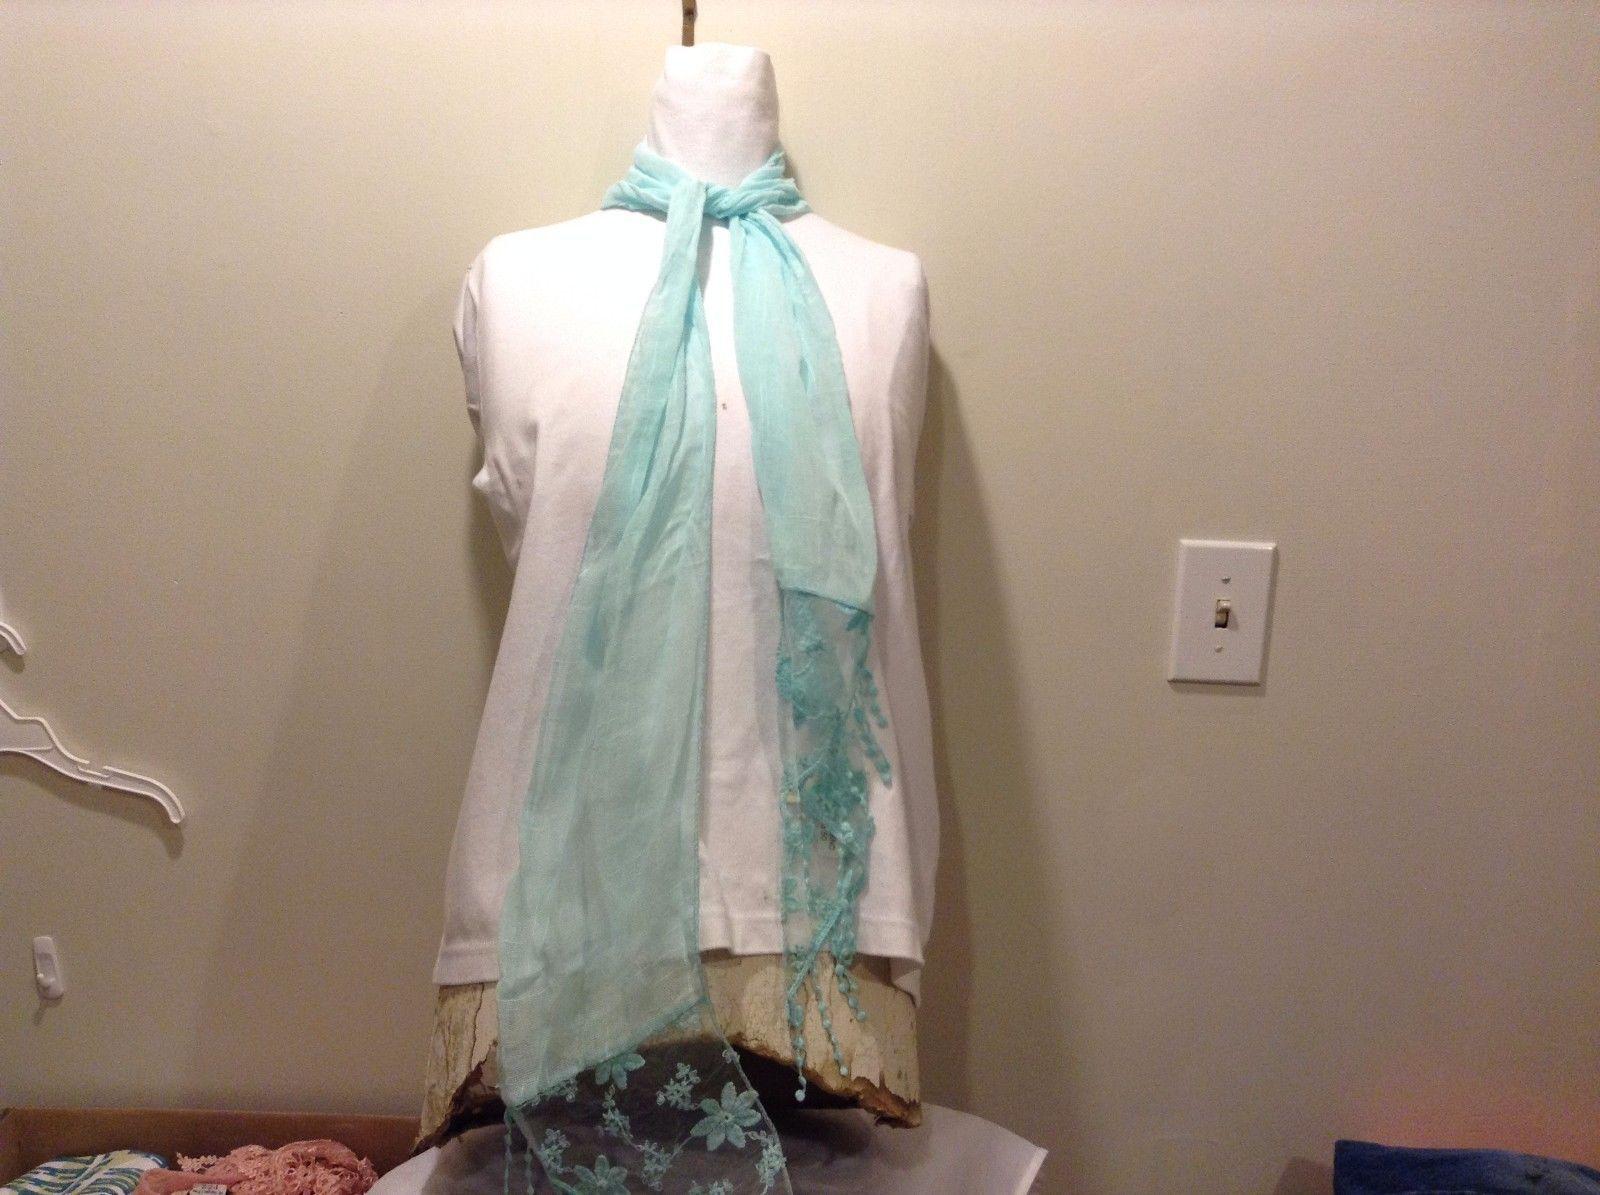 Light Blue Sheer Scarf Diamond Floral Ends Polyester Blend